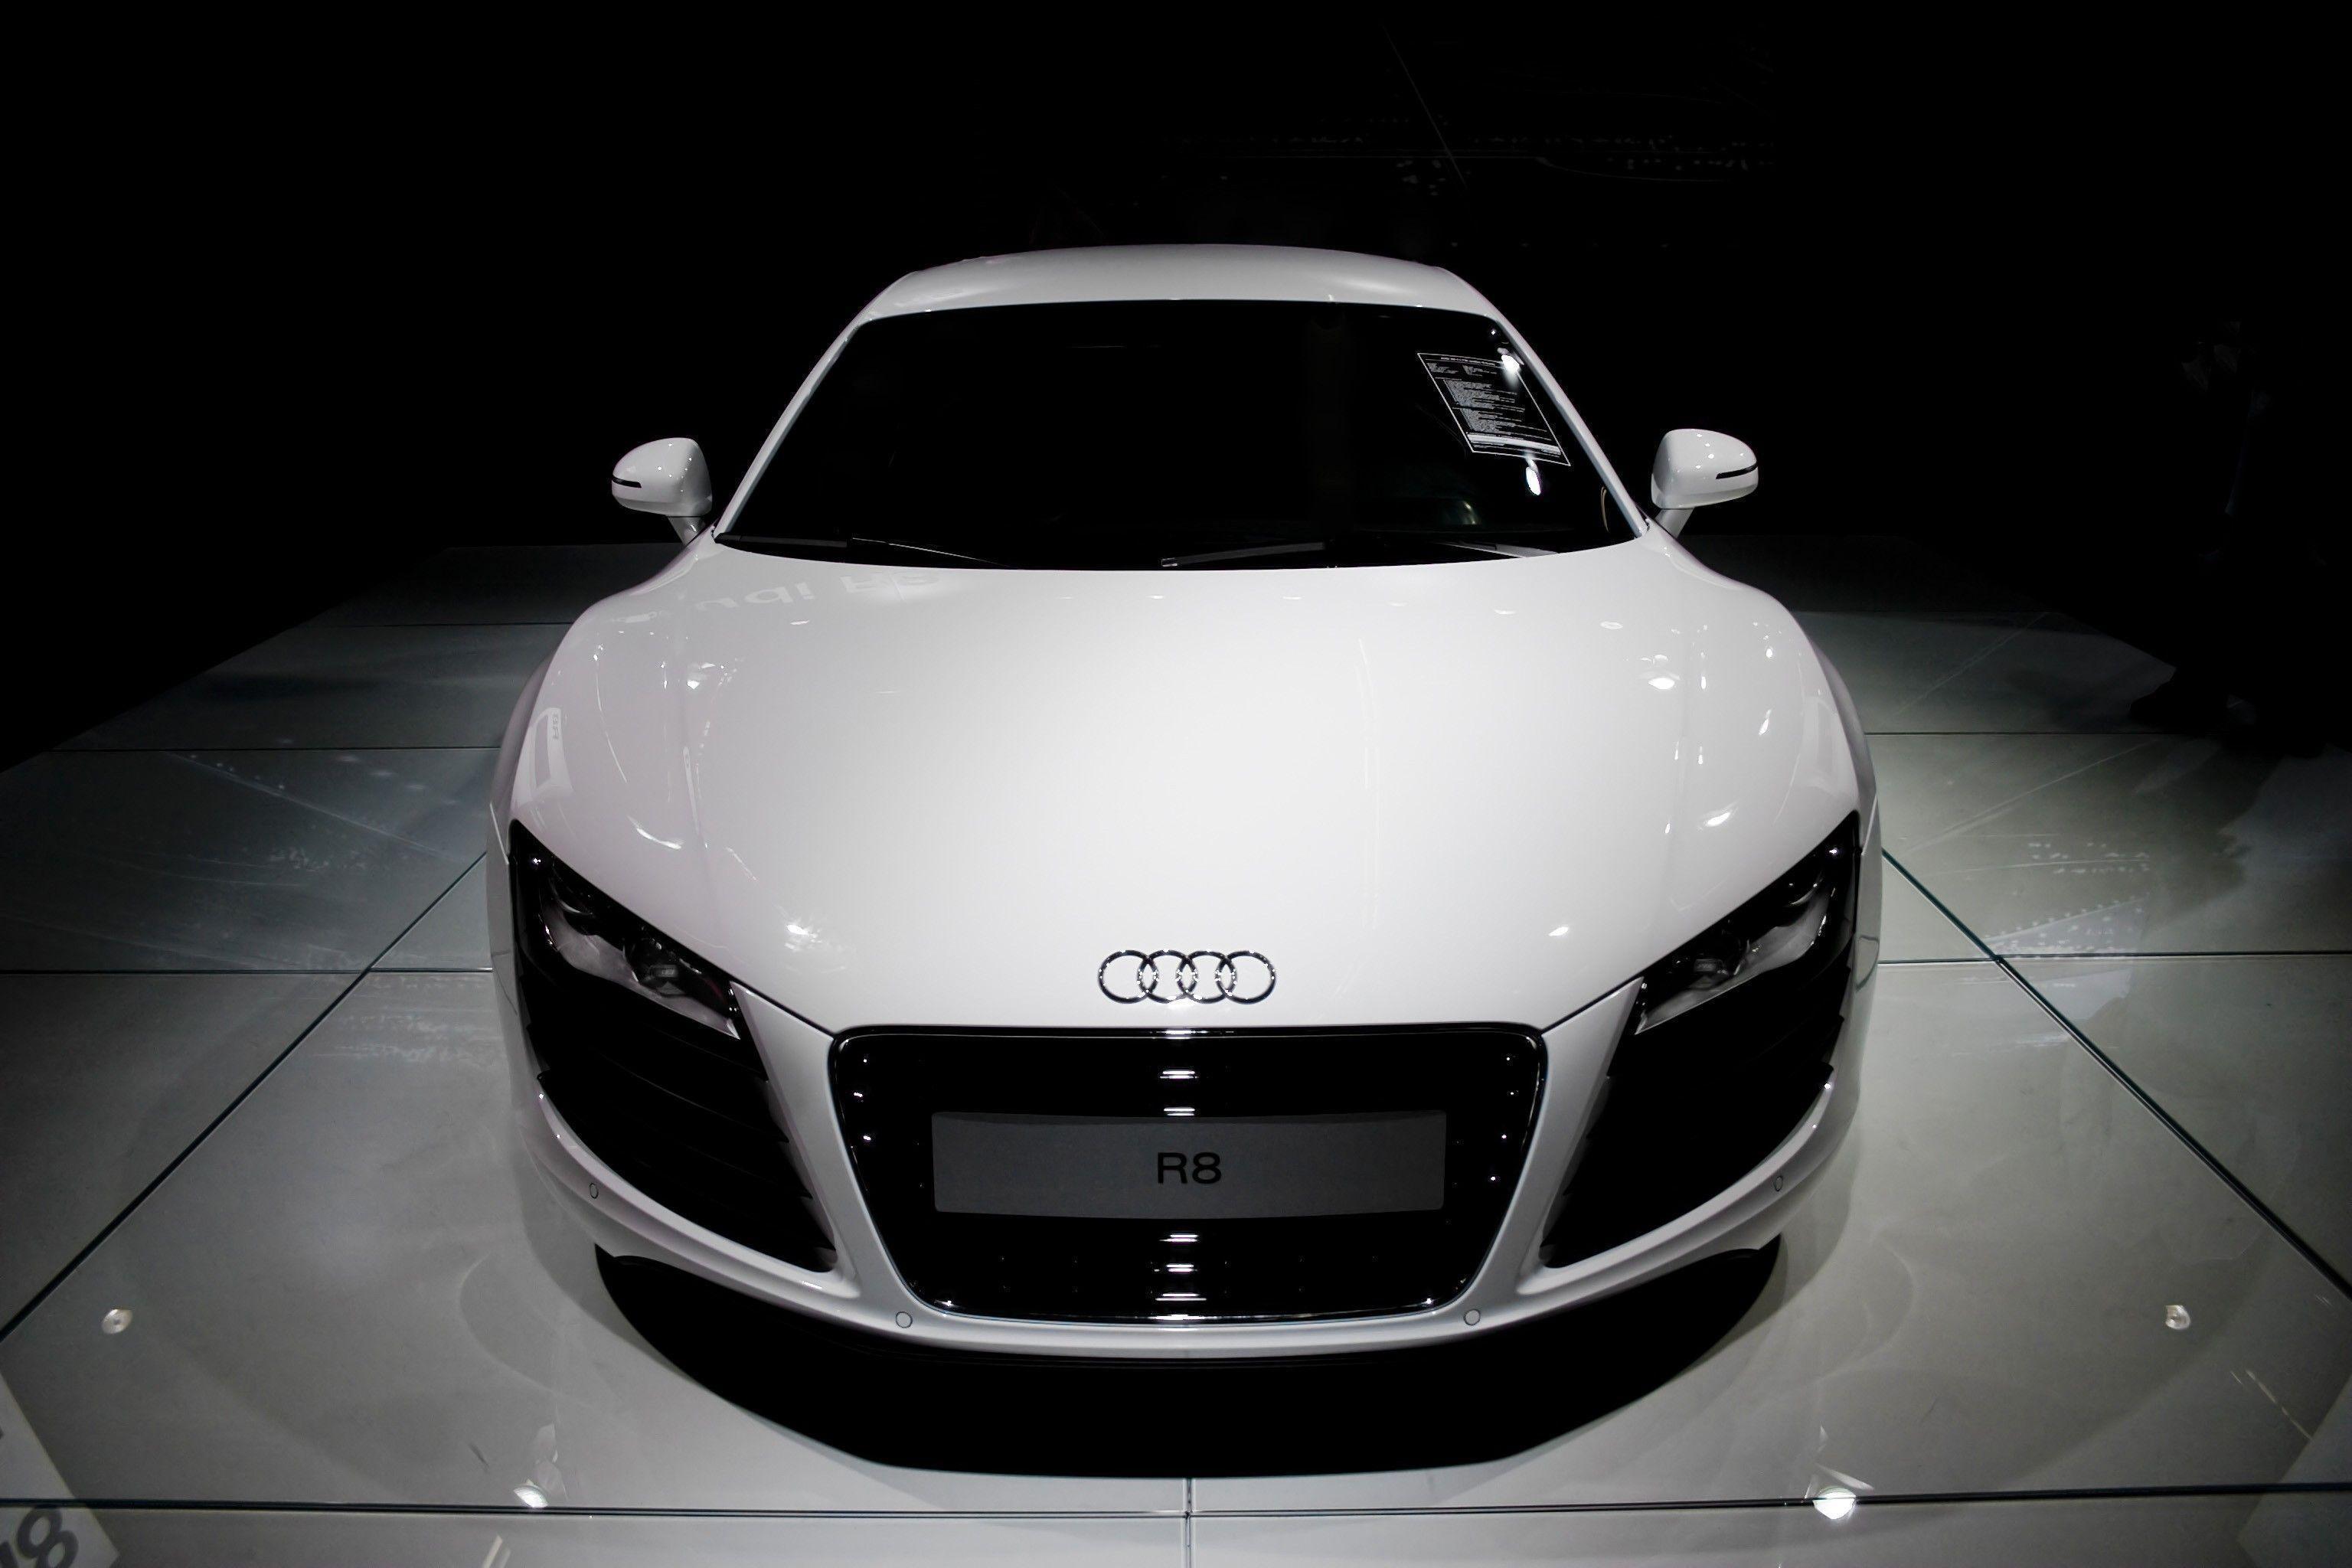 Audi R8 HD Resimleri